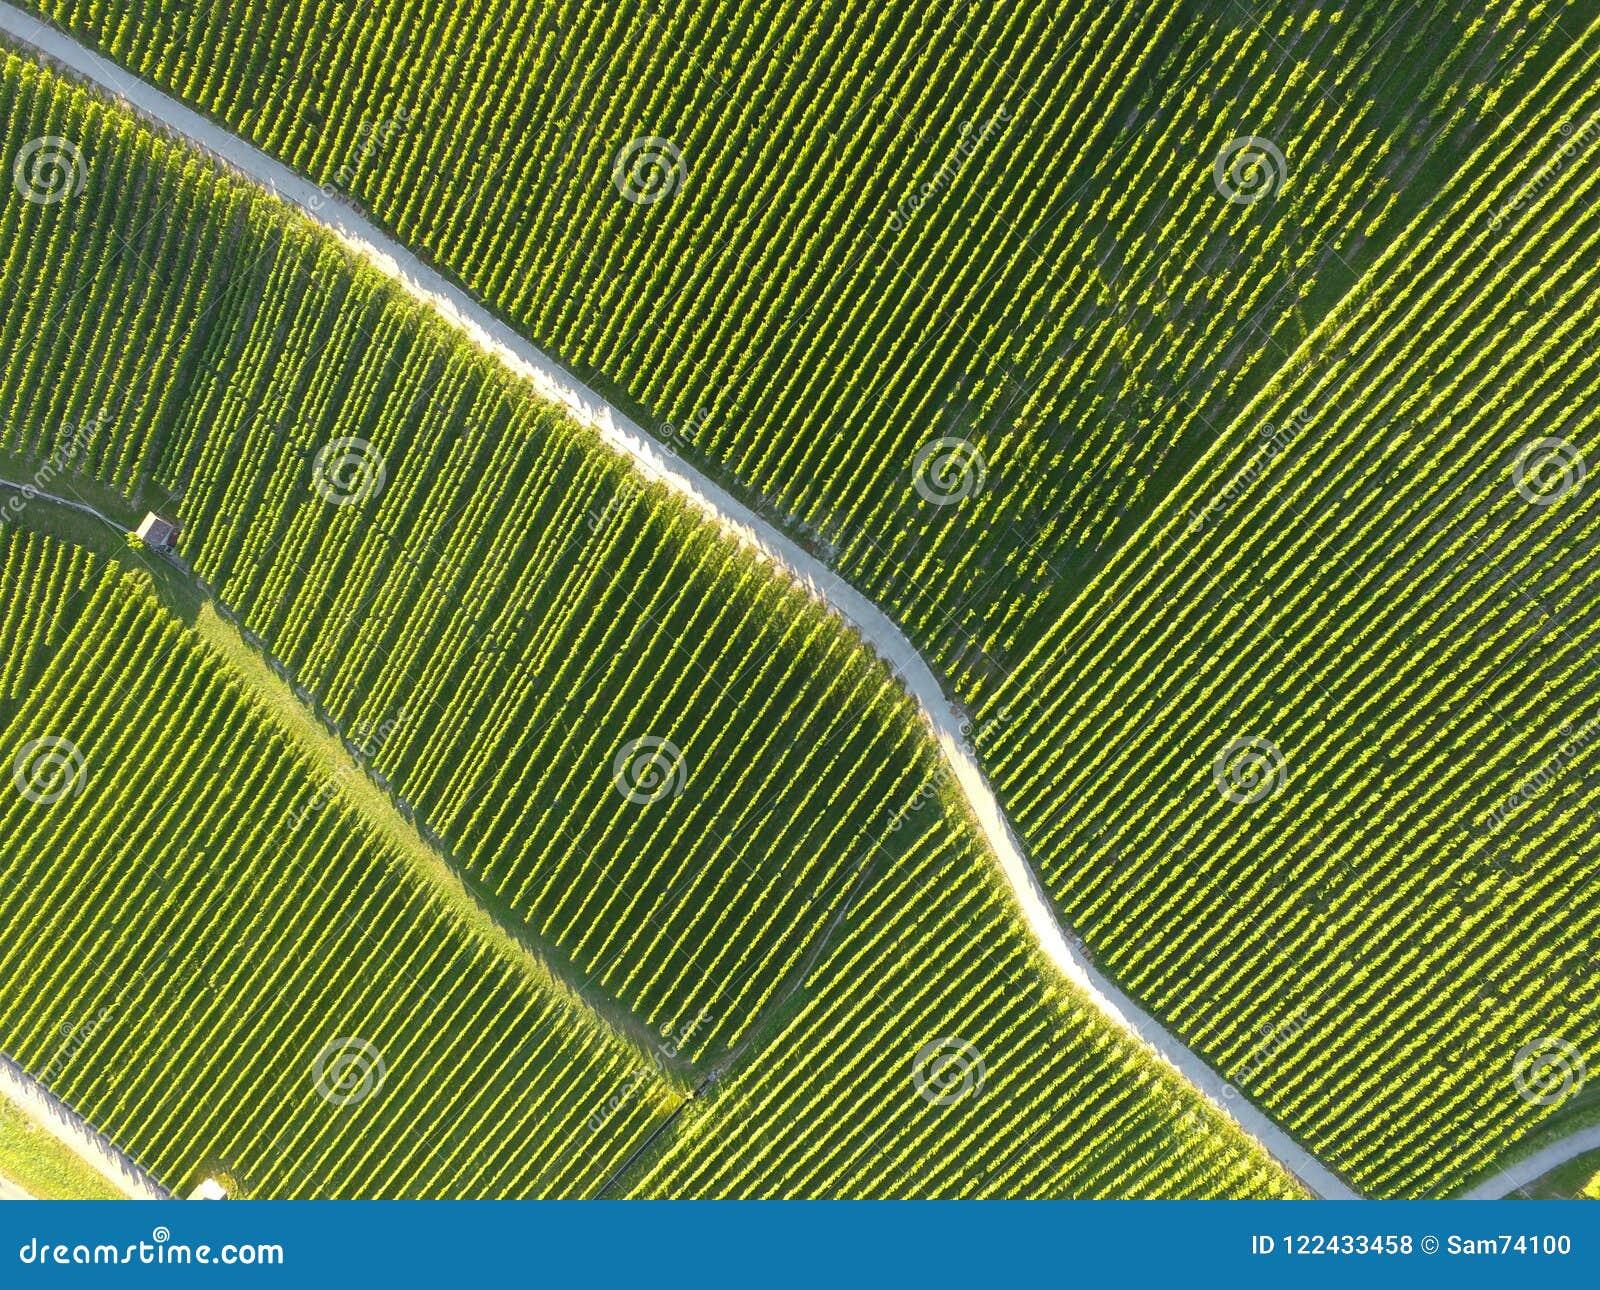 Aerial of Vineyard fields between Lausanne and Geneva, Switzer